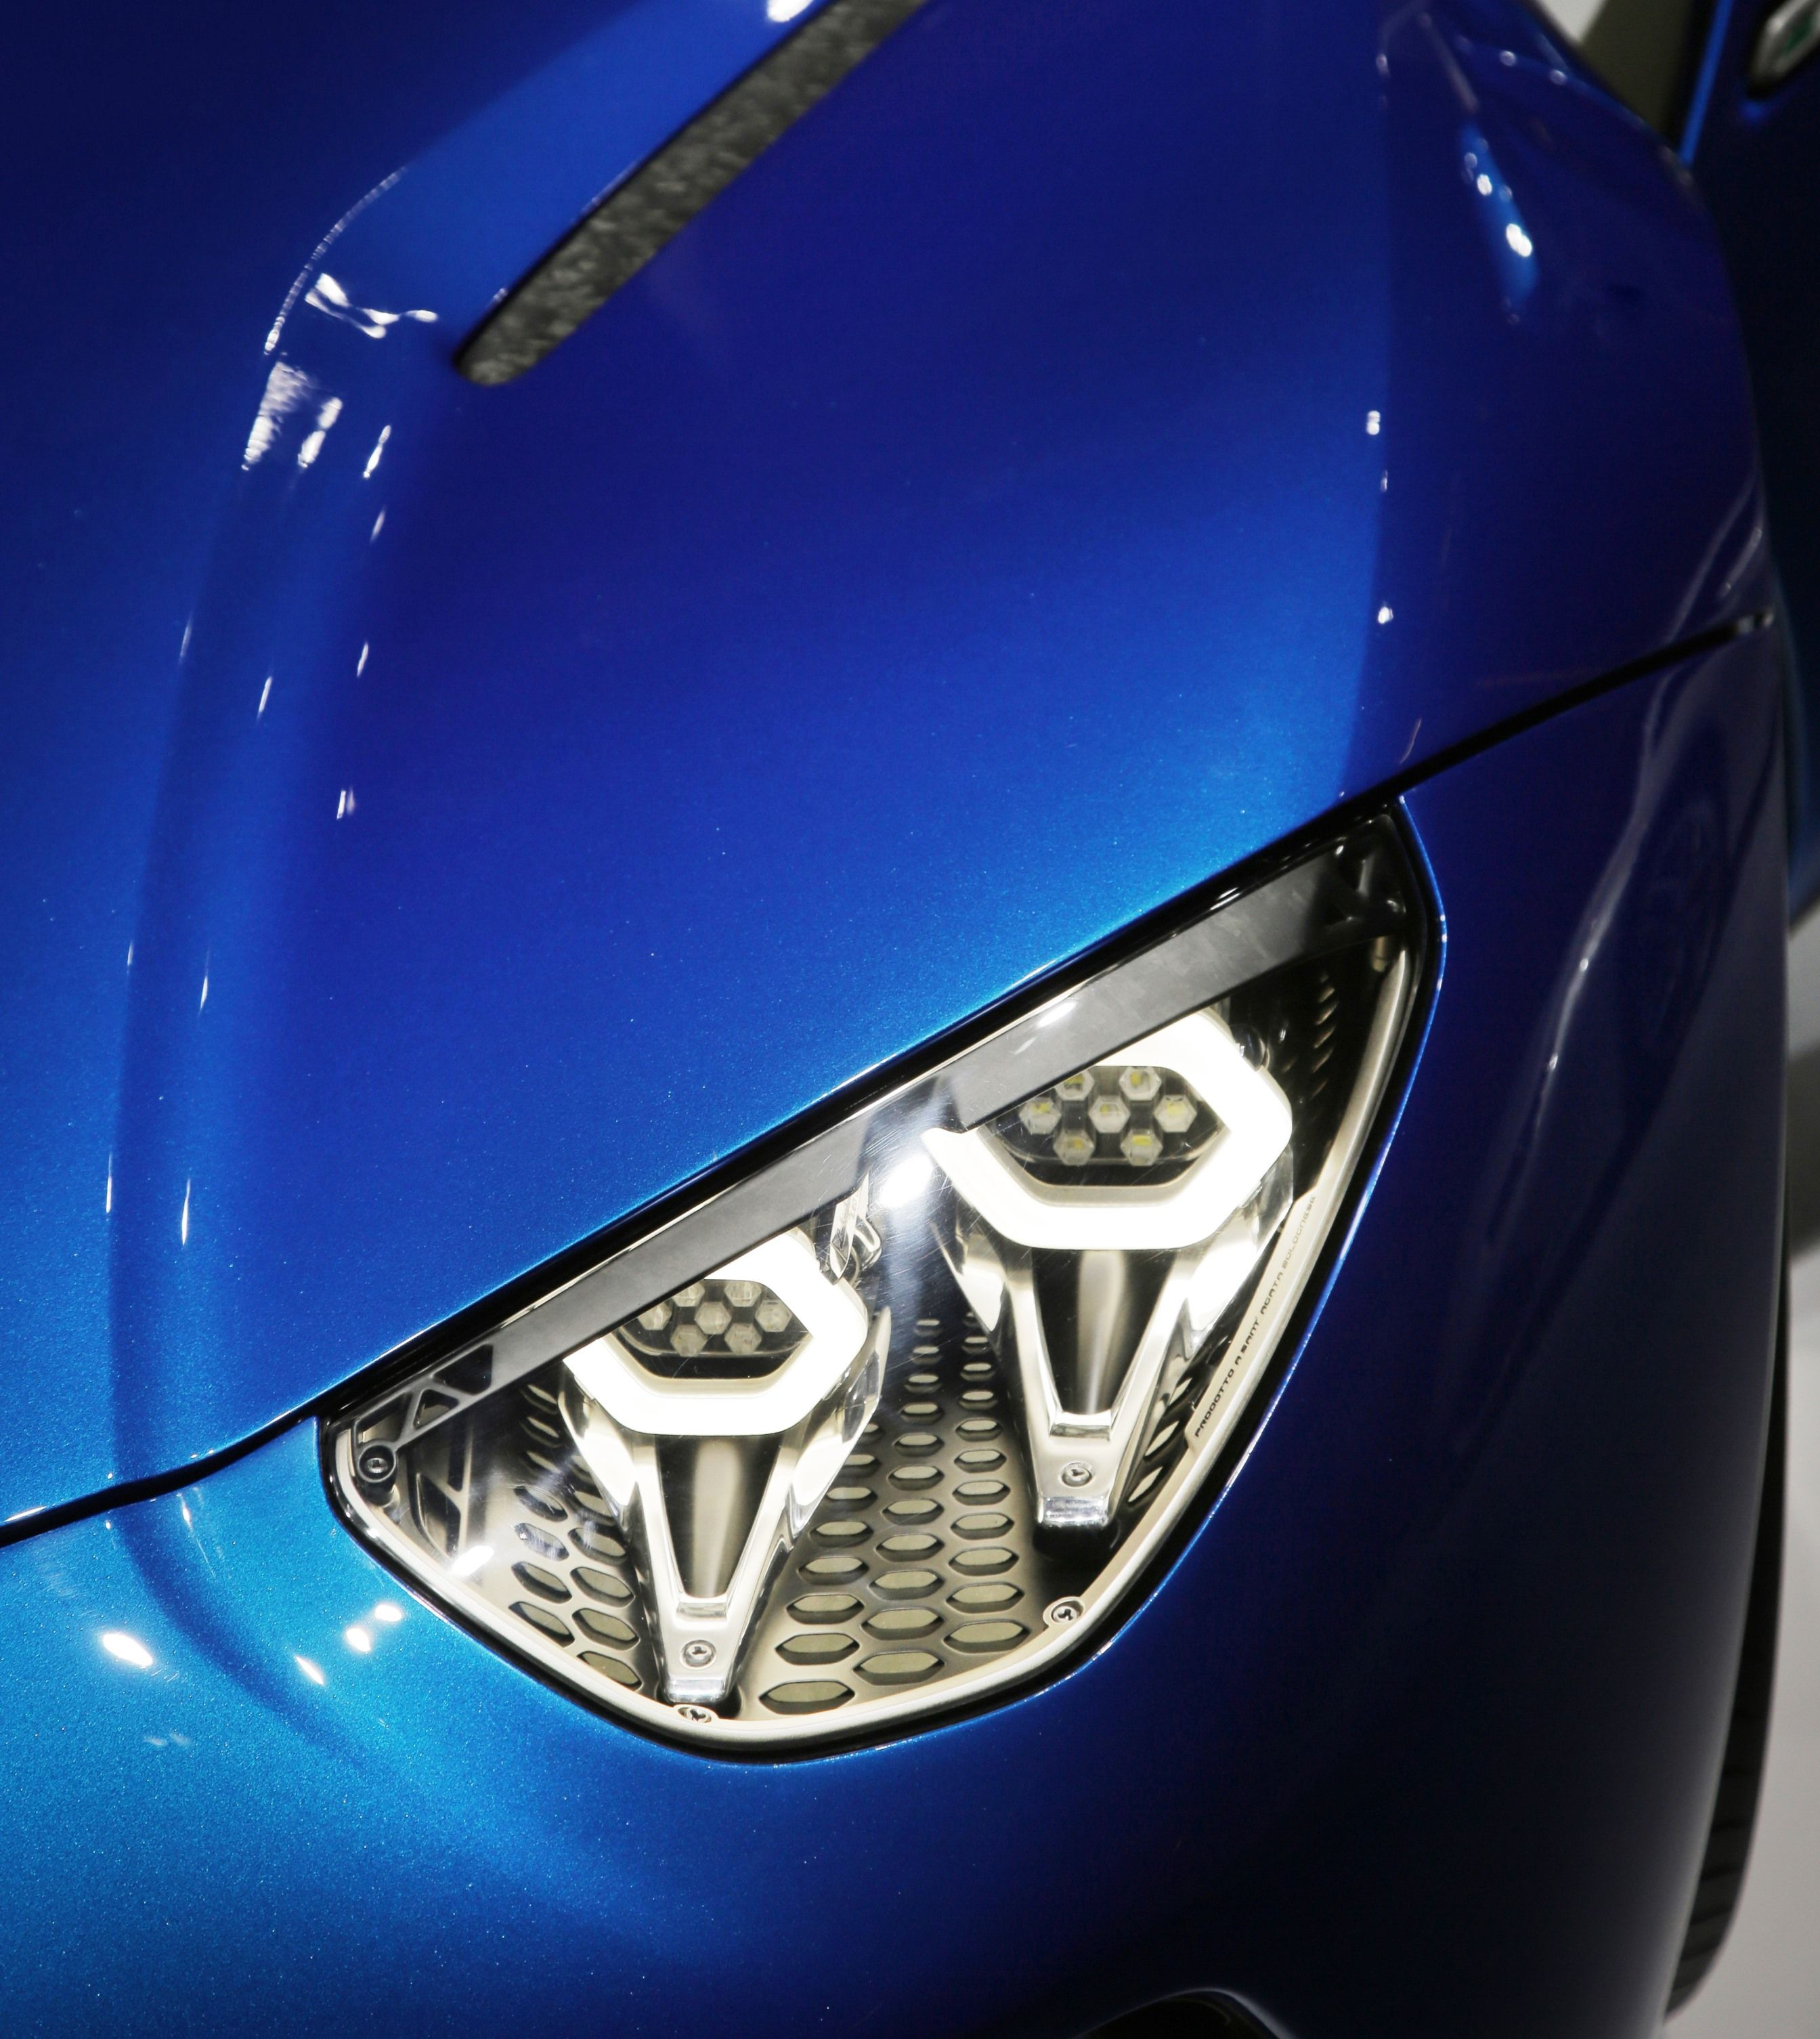 Asterion Returns! Lamborghini LPI 910-4 Asterion Is Back